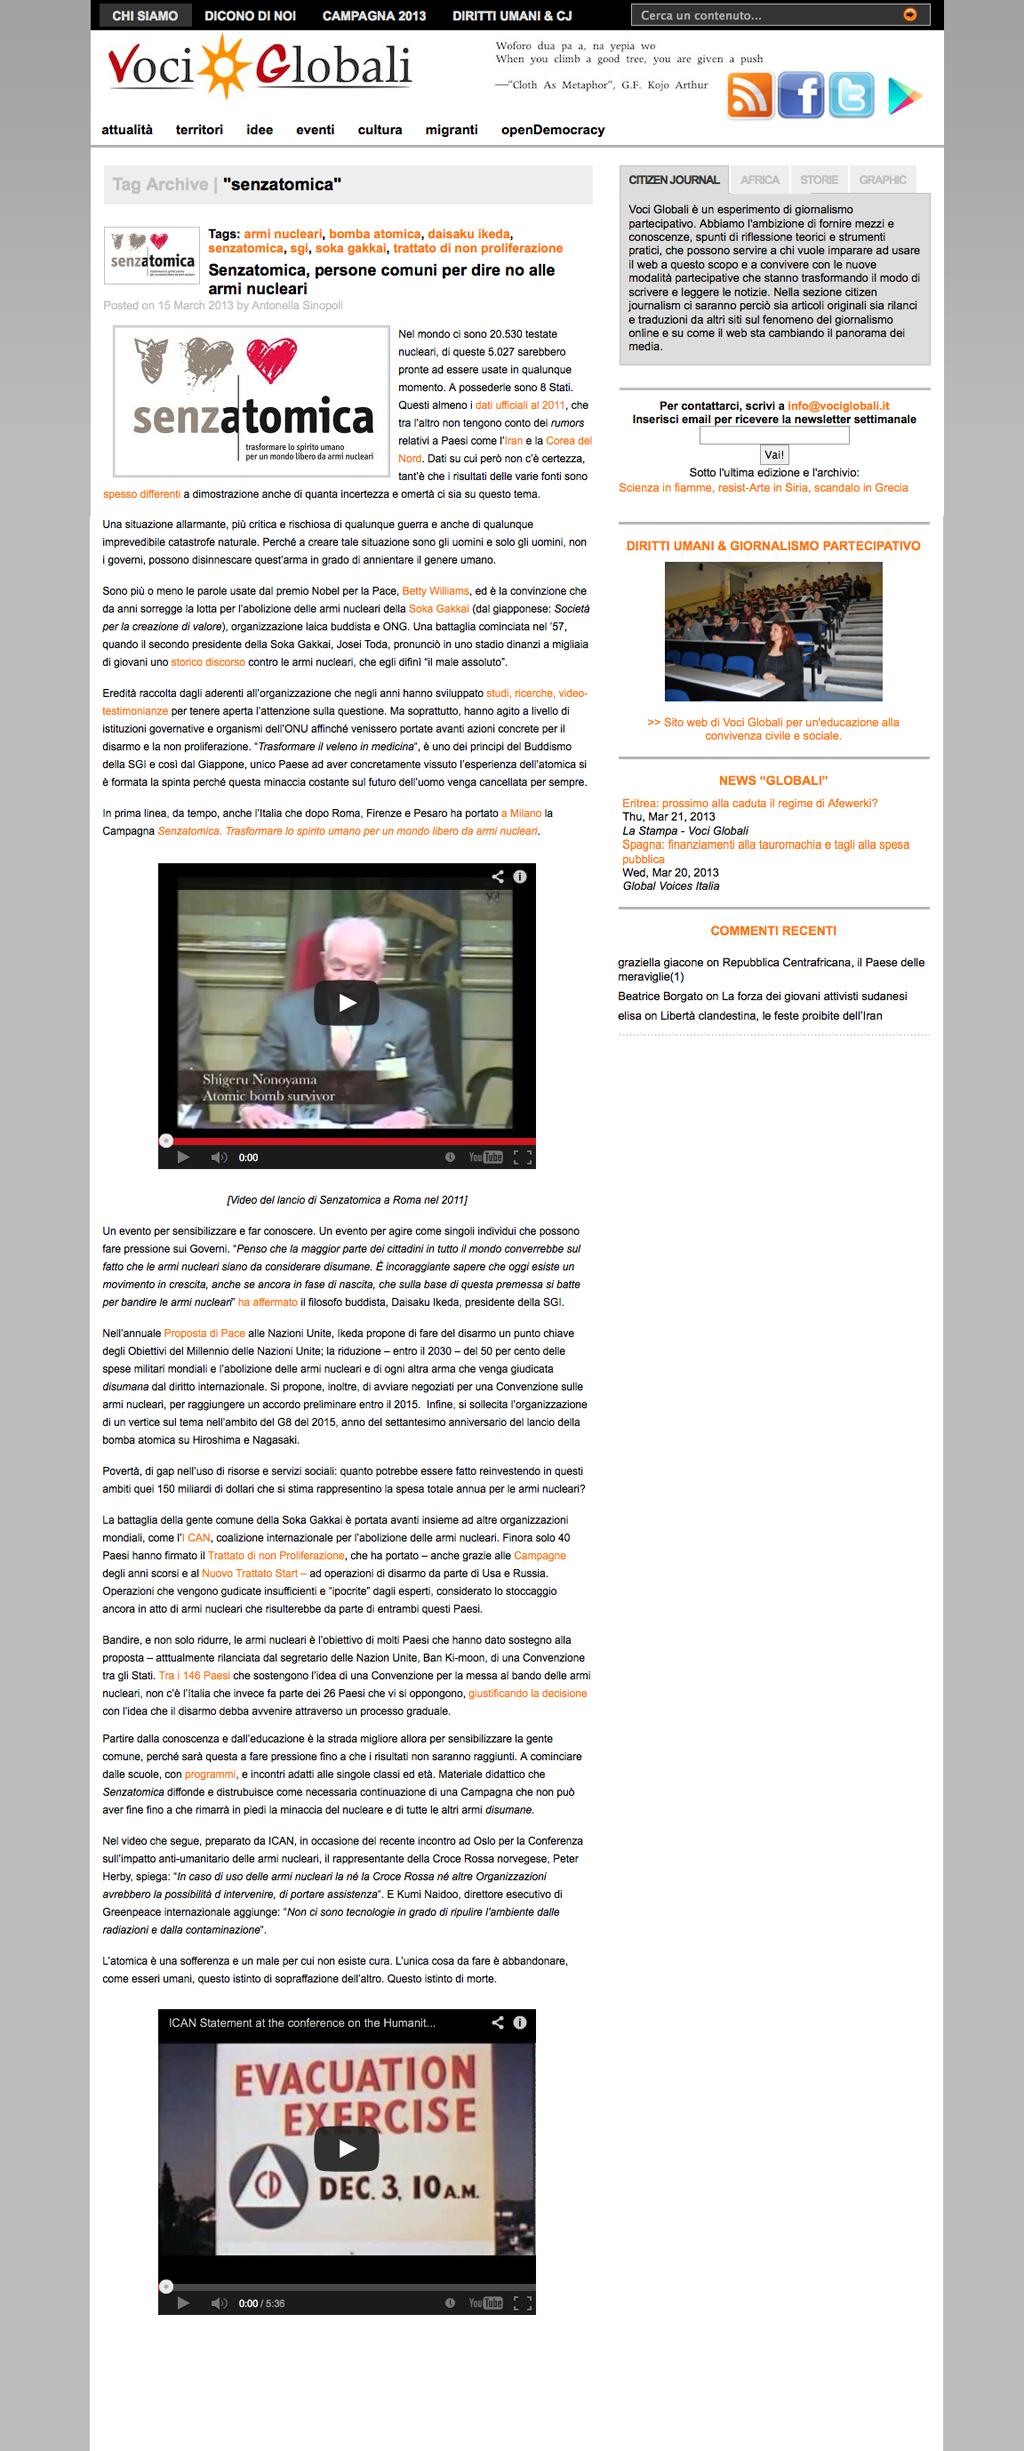 2013-03-15 Voci Globali